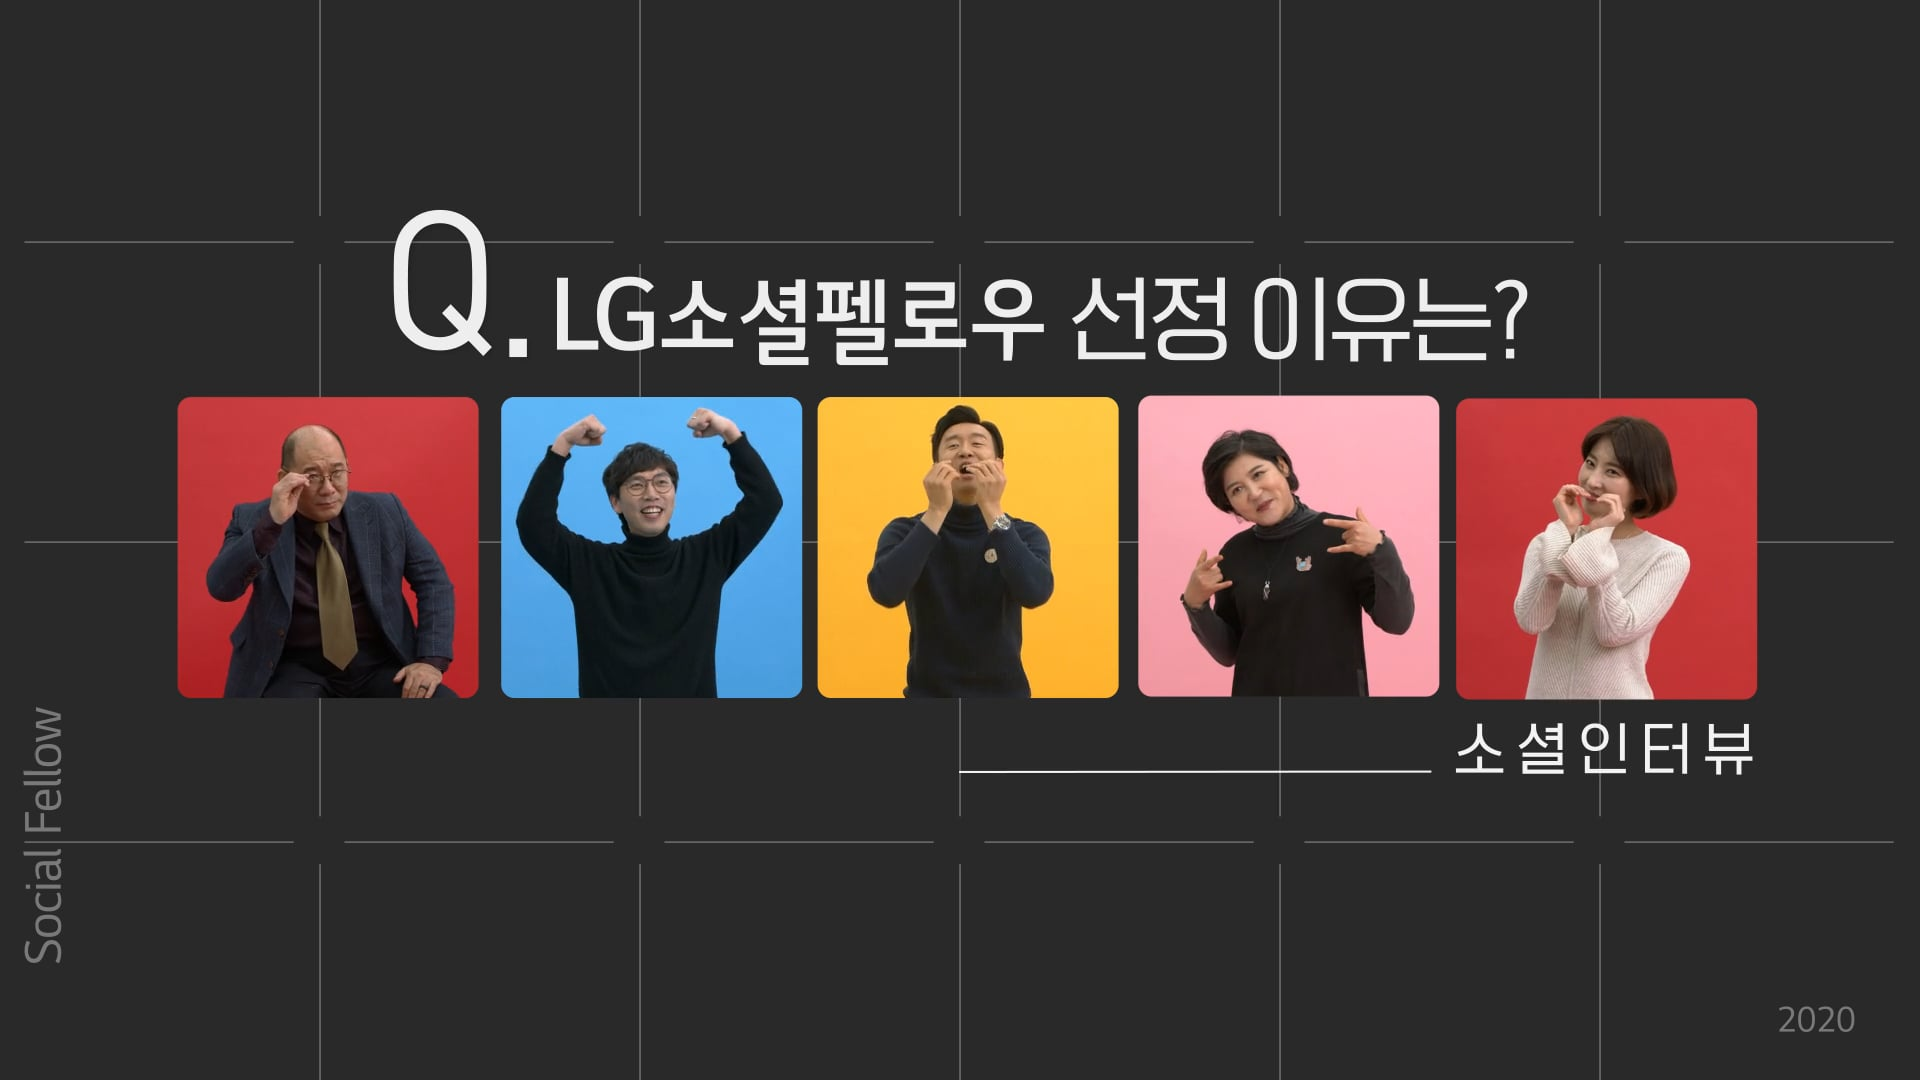 LGSC_소셜인터뷰(official)